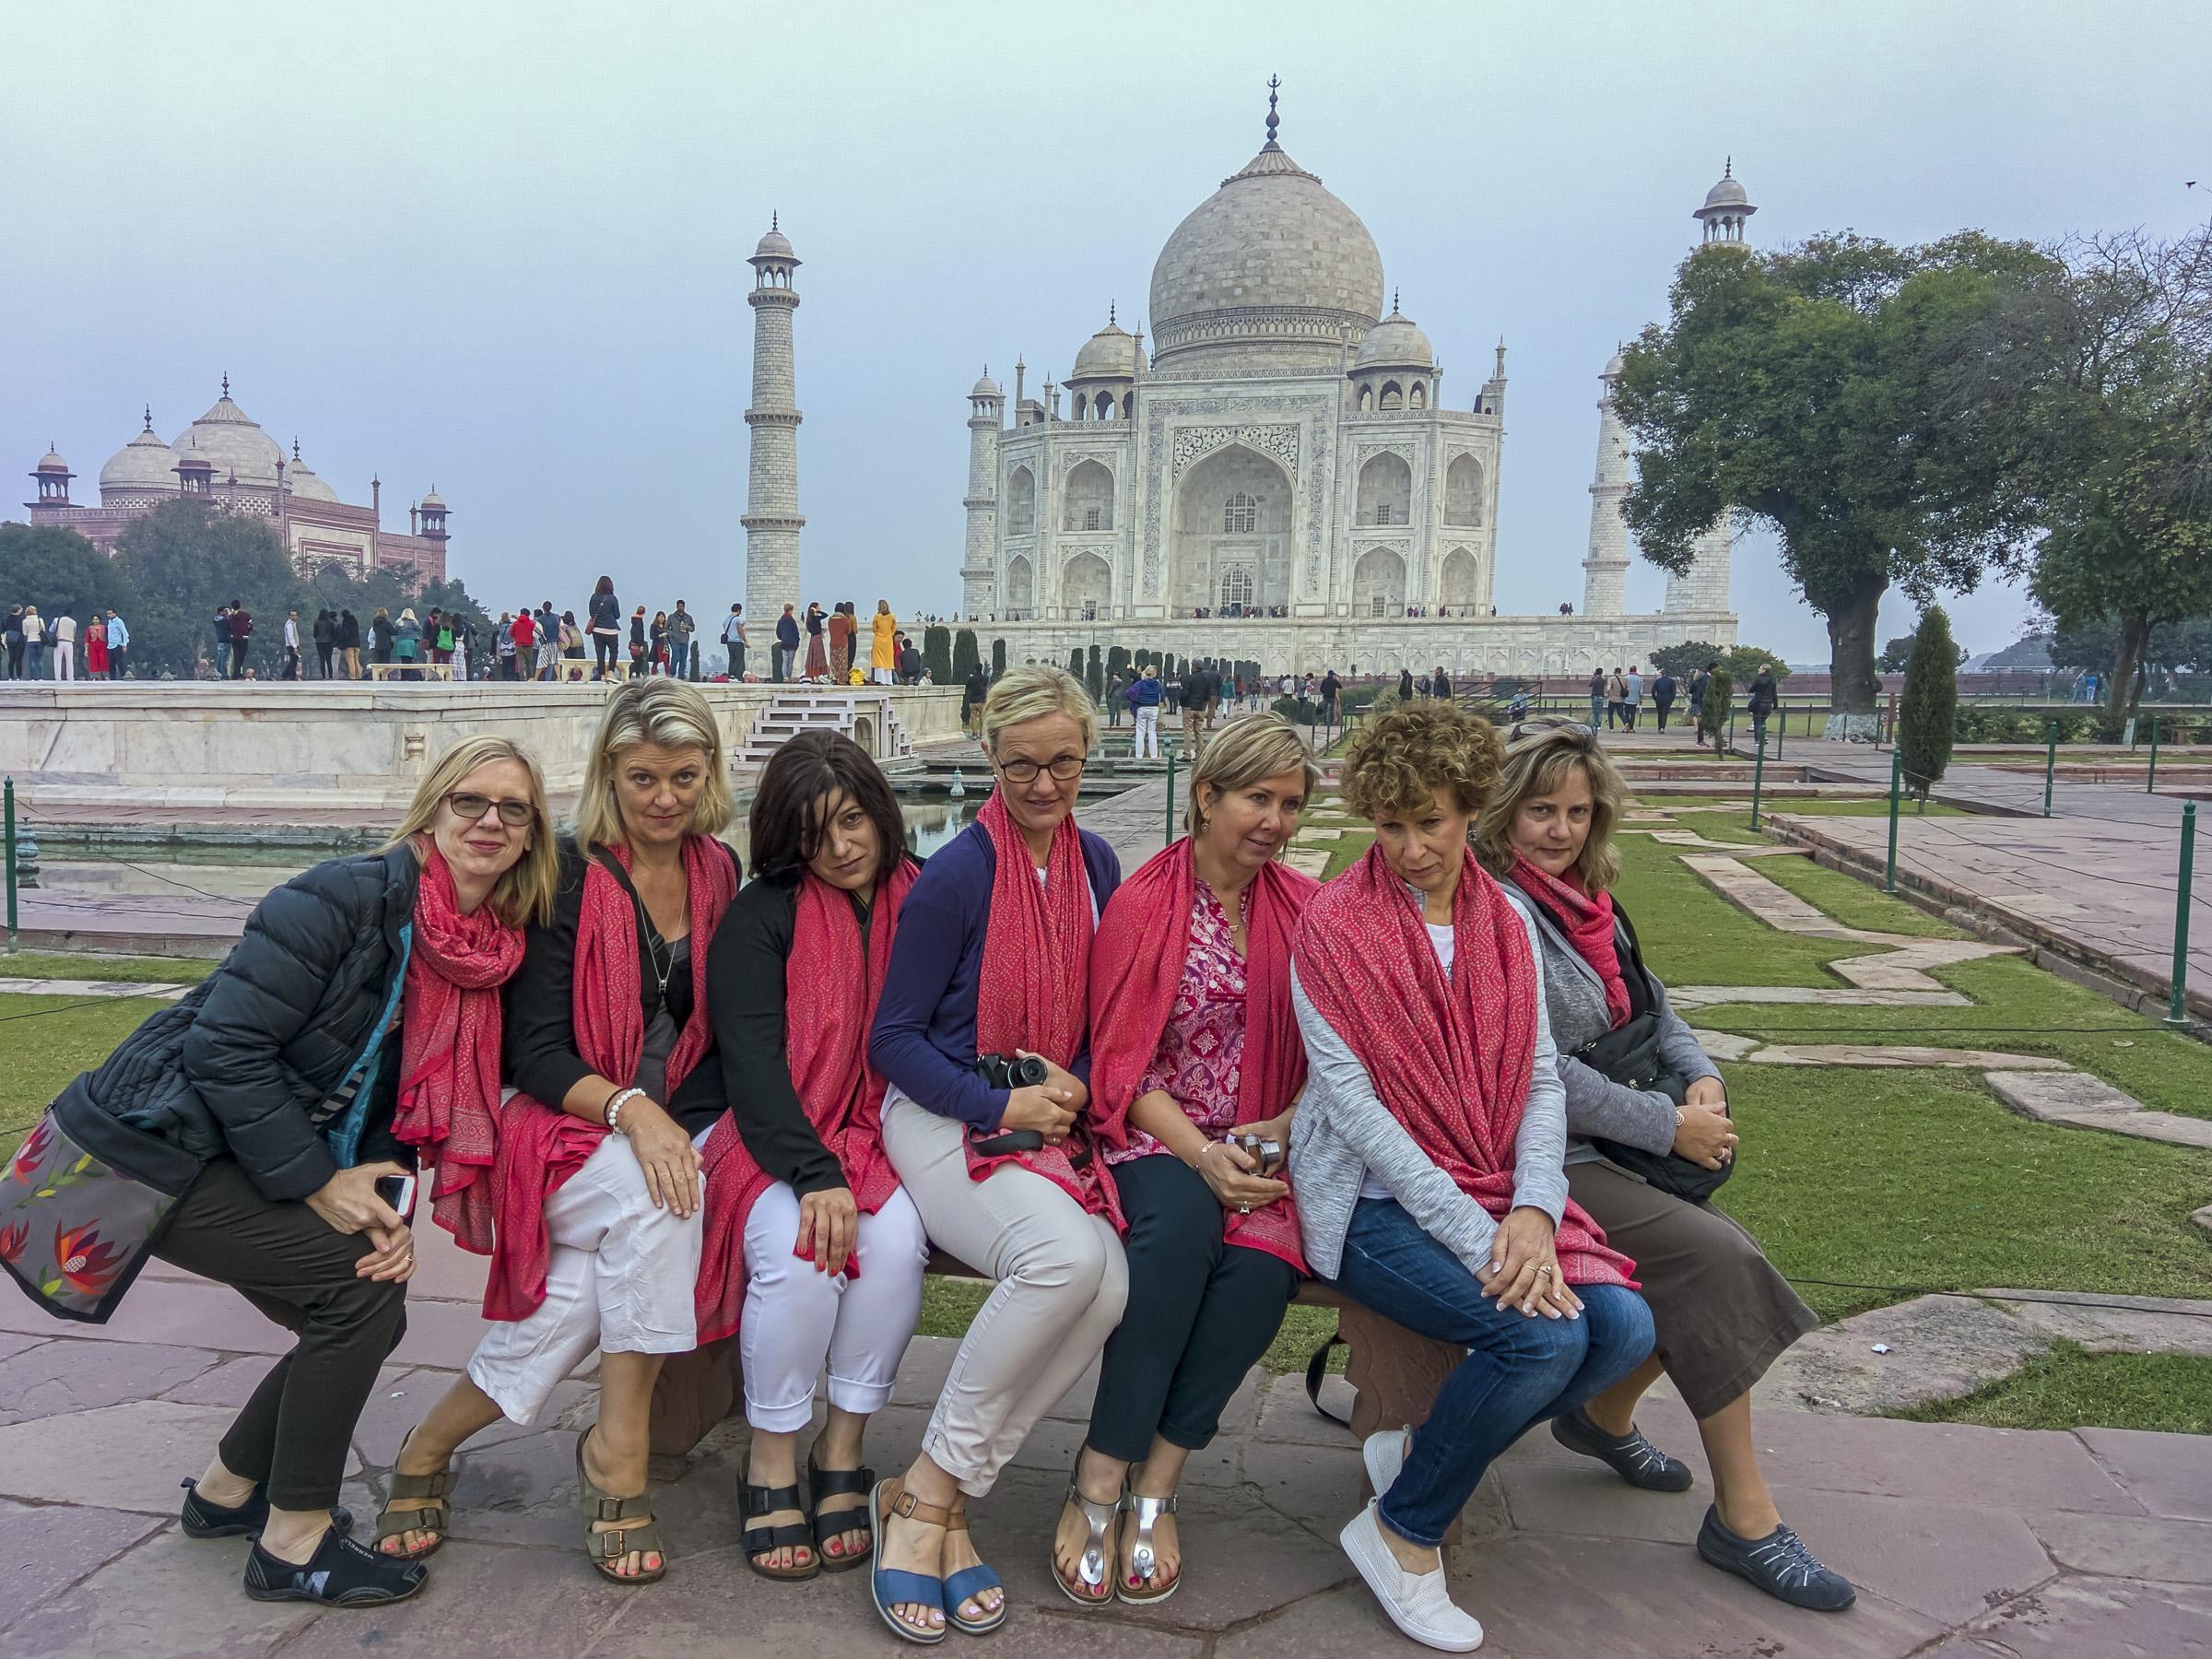 India2018_032_L16_00380.jpg